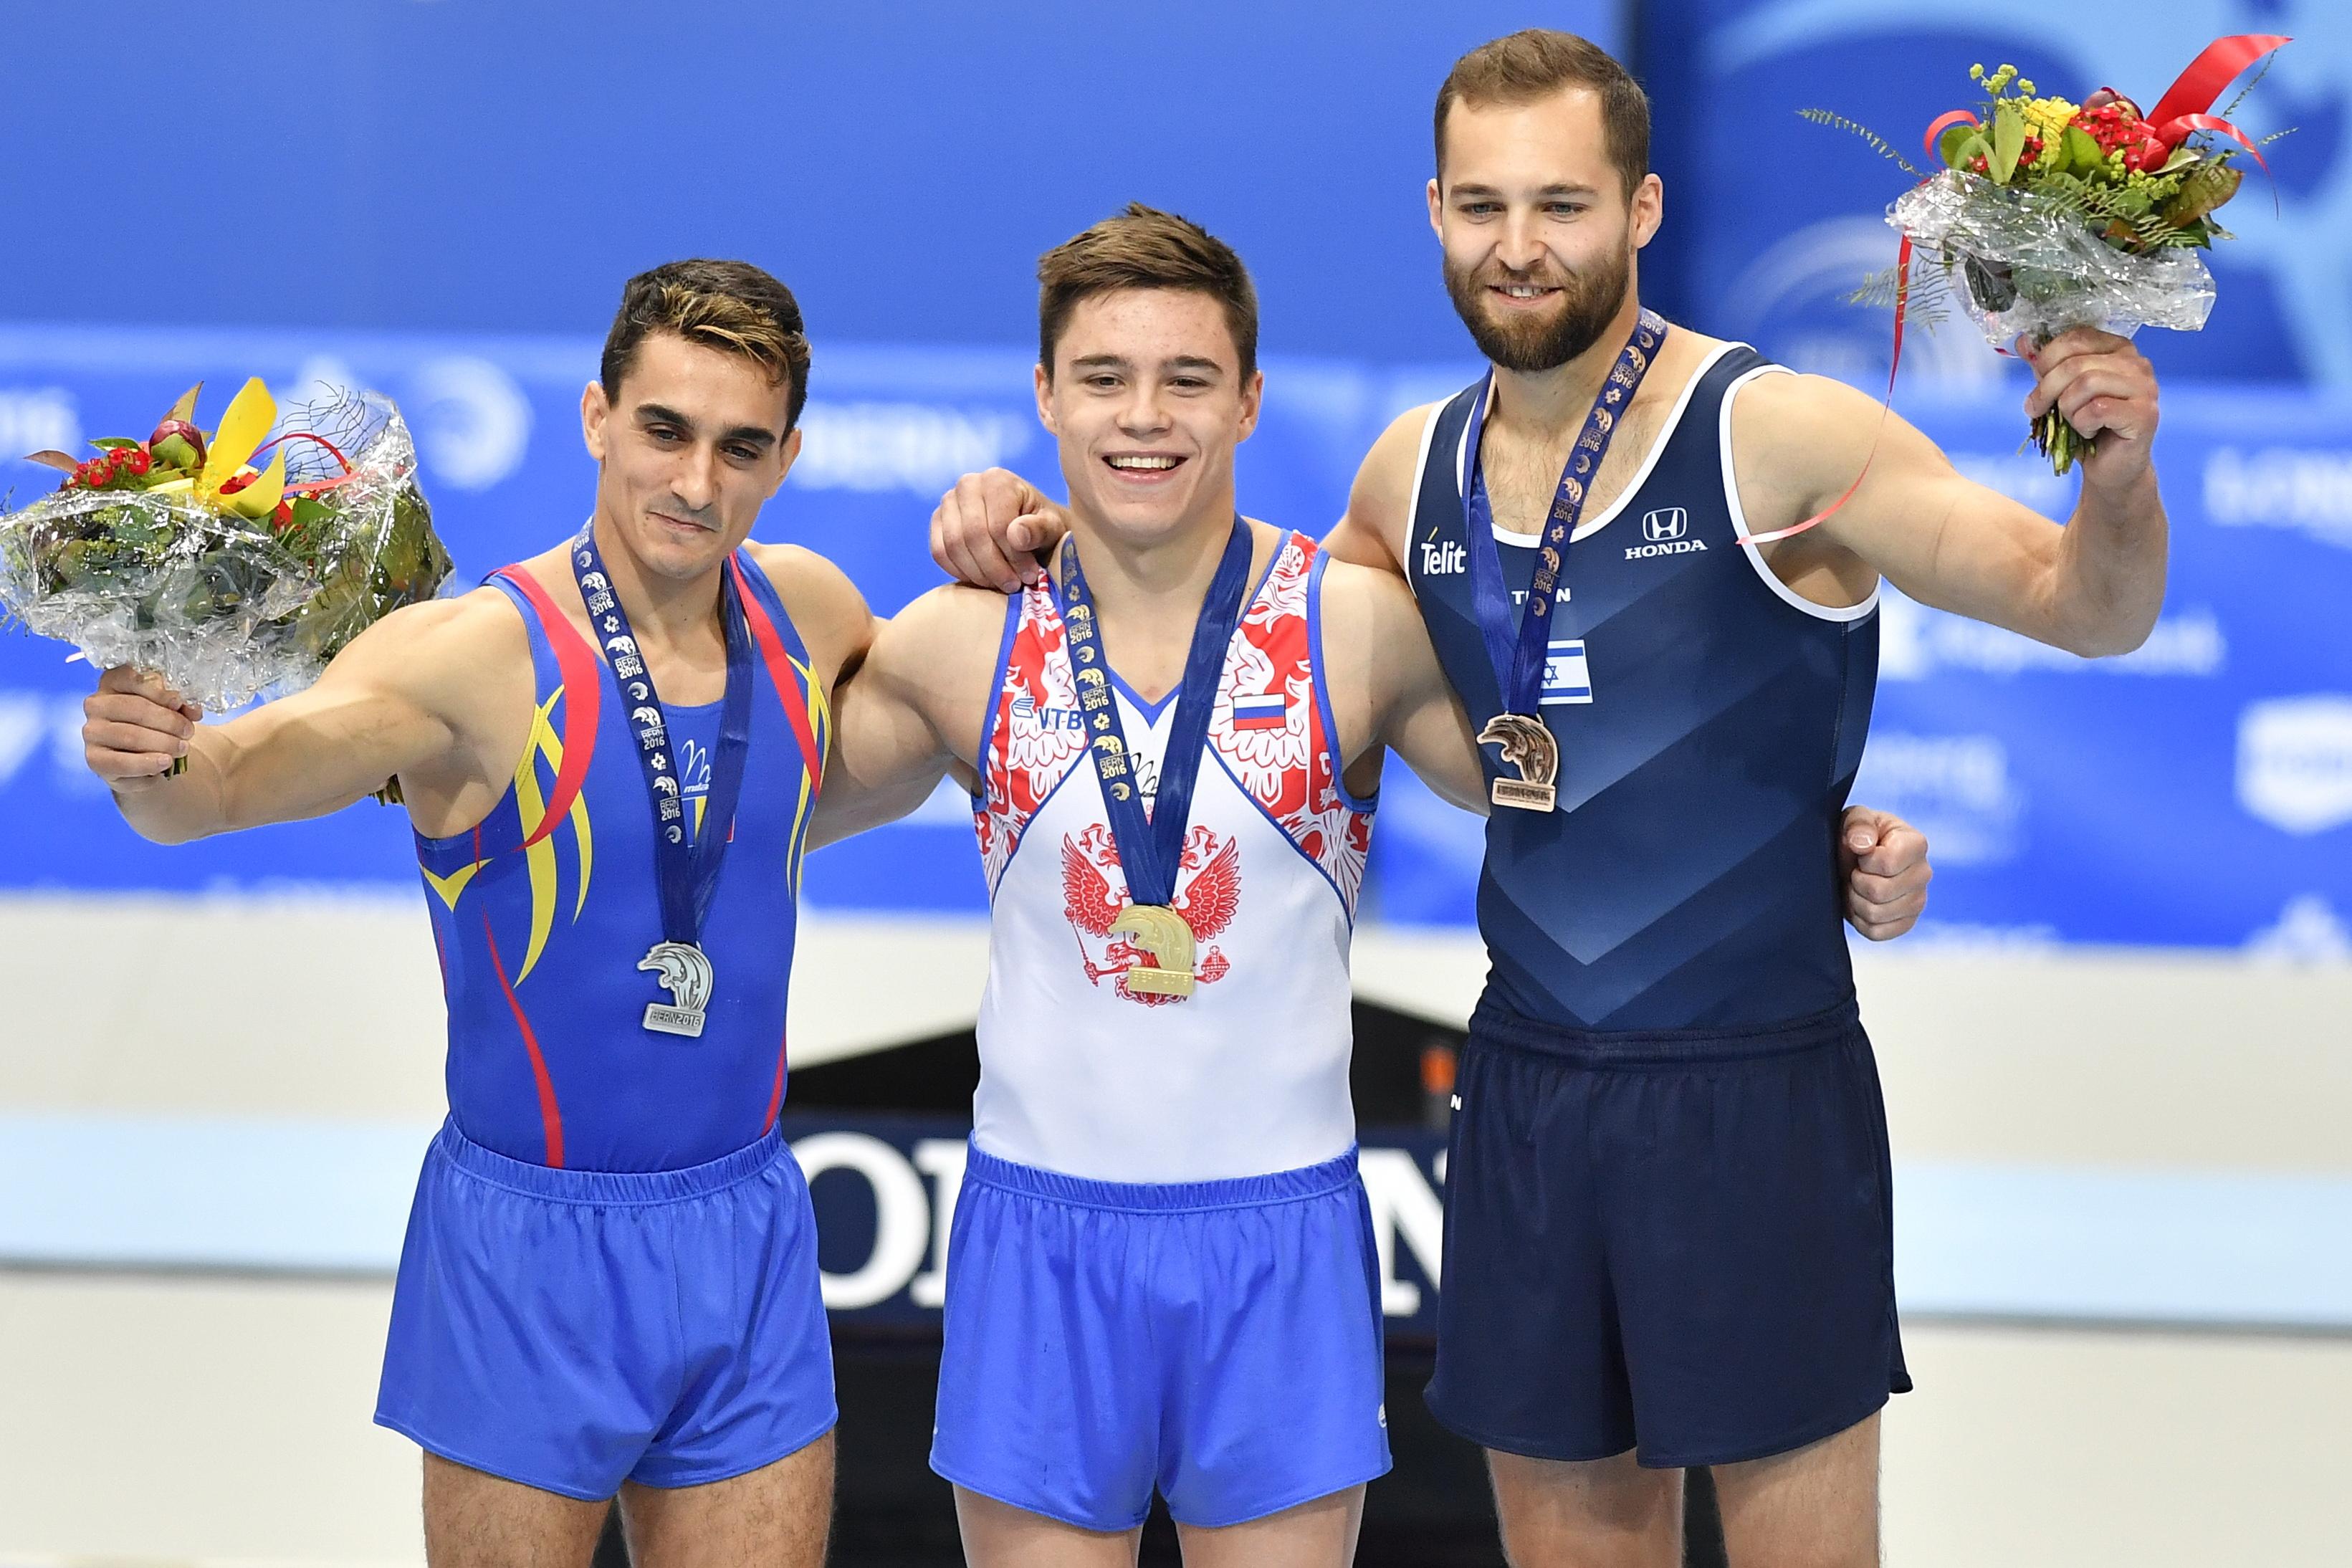 Marian Dragulescu, medaliat cu argint la sol si sarituri la Campionatele Europene de gimnastica artistica masculina din Berna